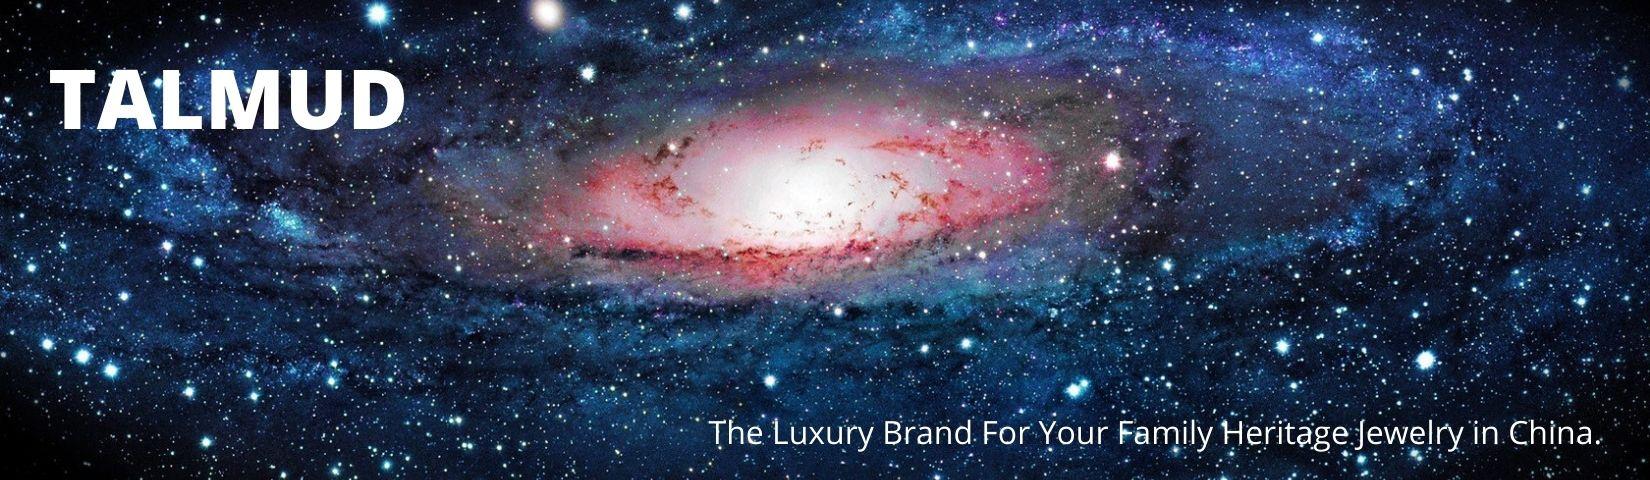 TALMUD Your Luxury Jewelry Partner